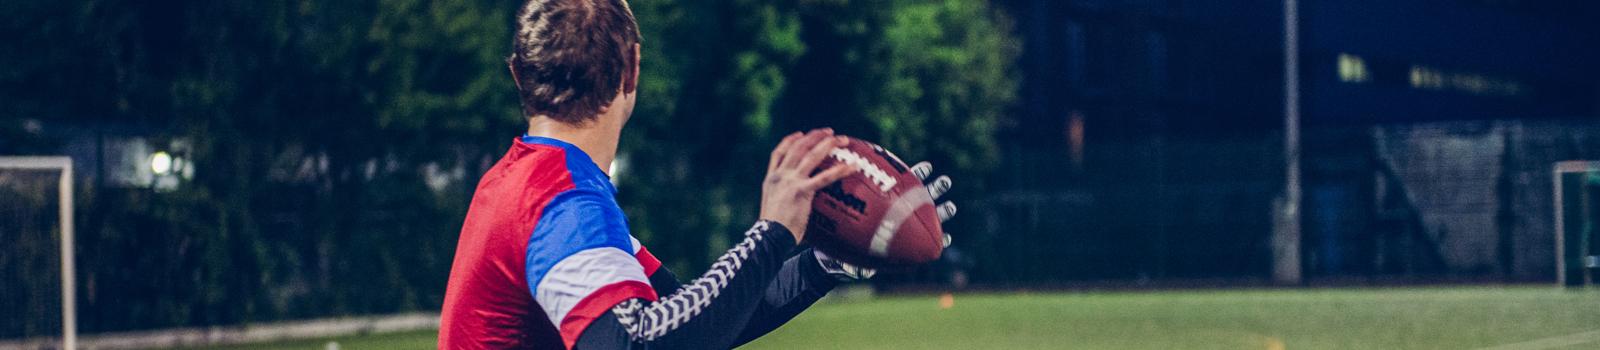 american football thrower